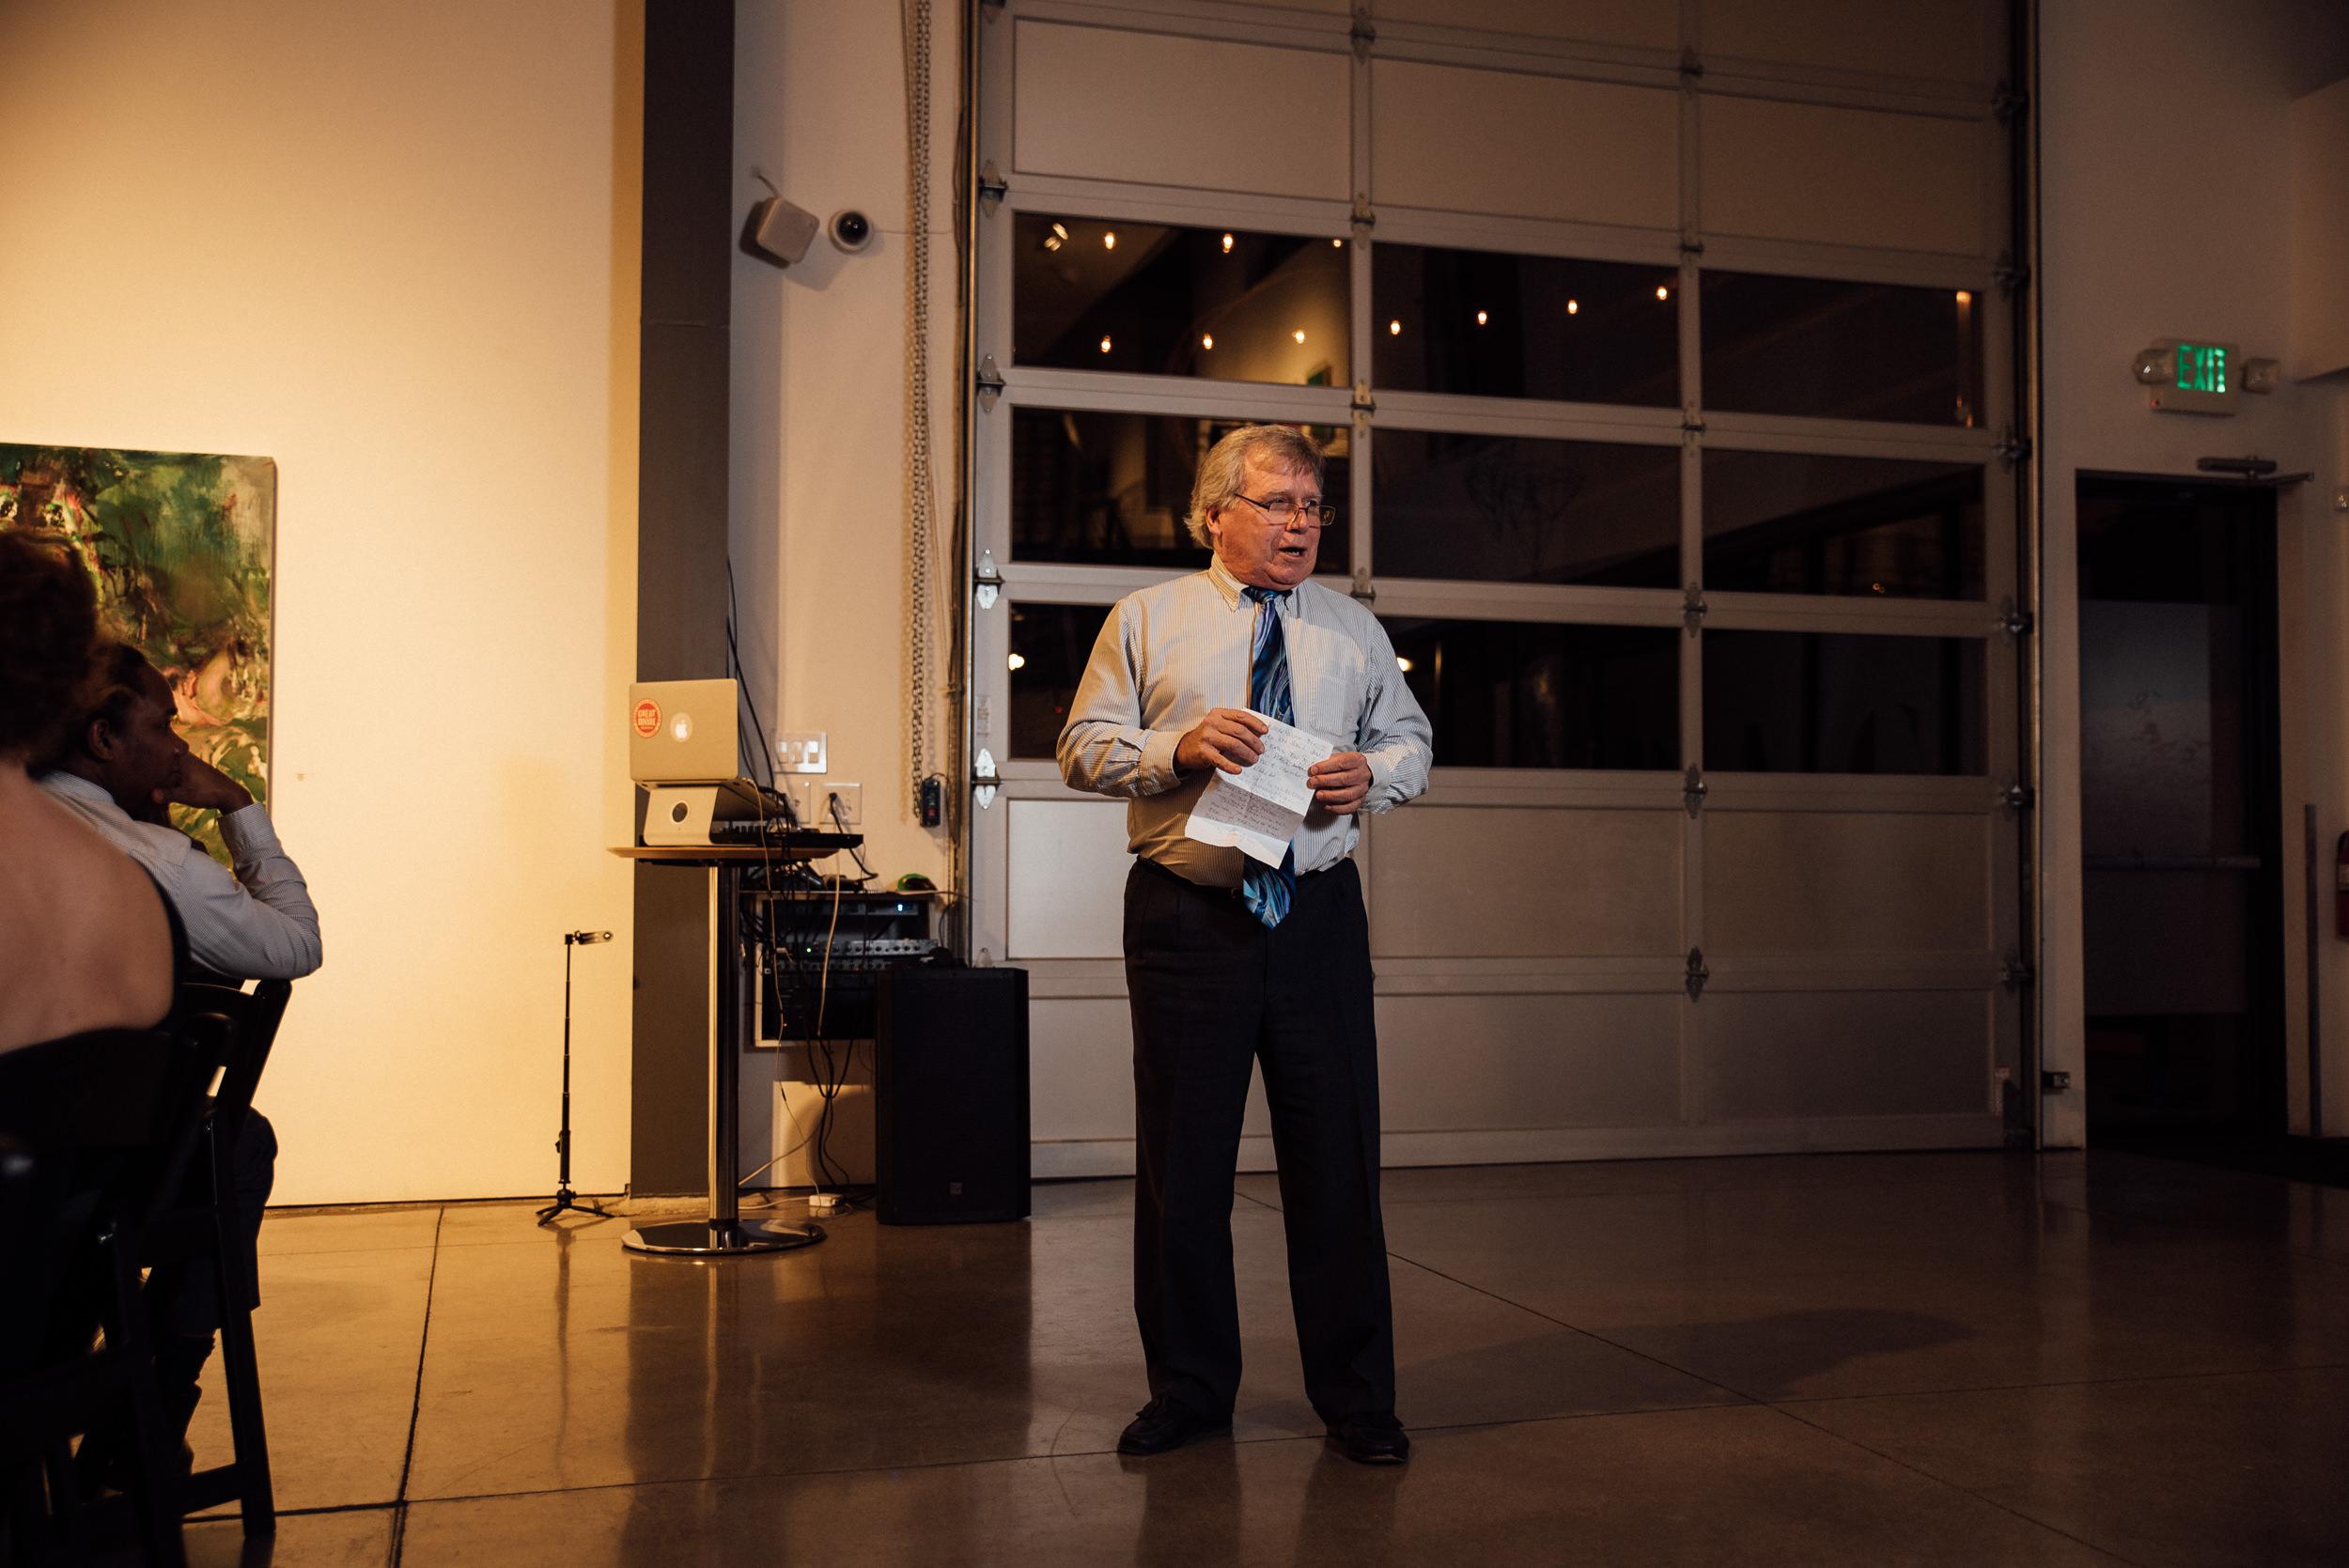 Speech at the Denver Space Gallery-Colorado wedding photographer